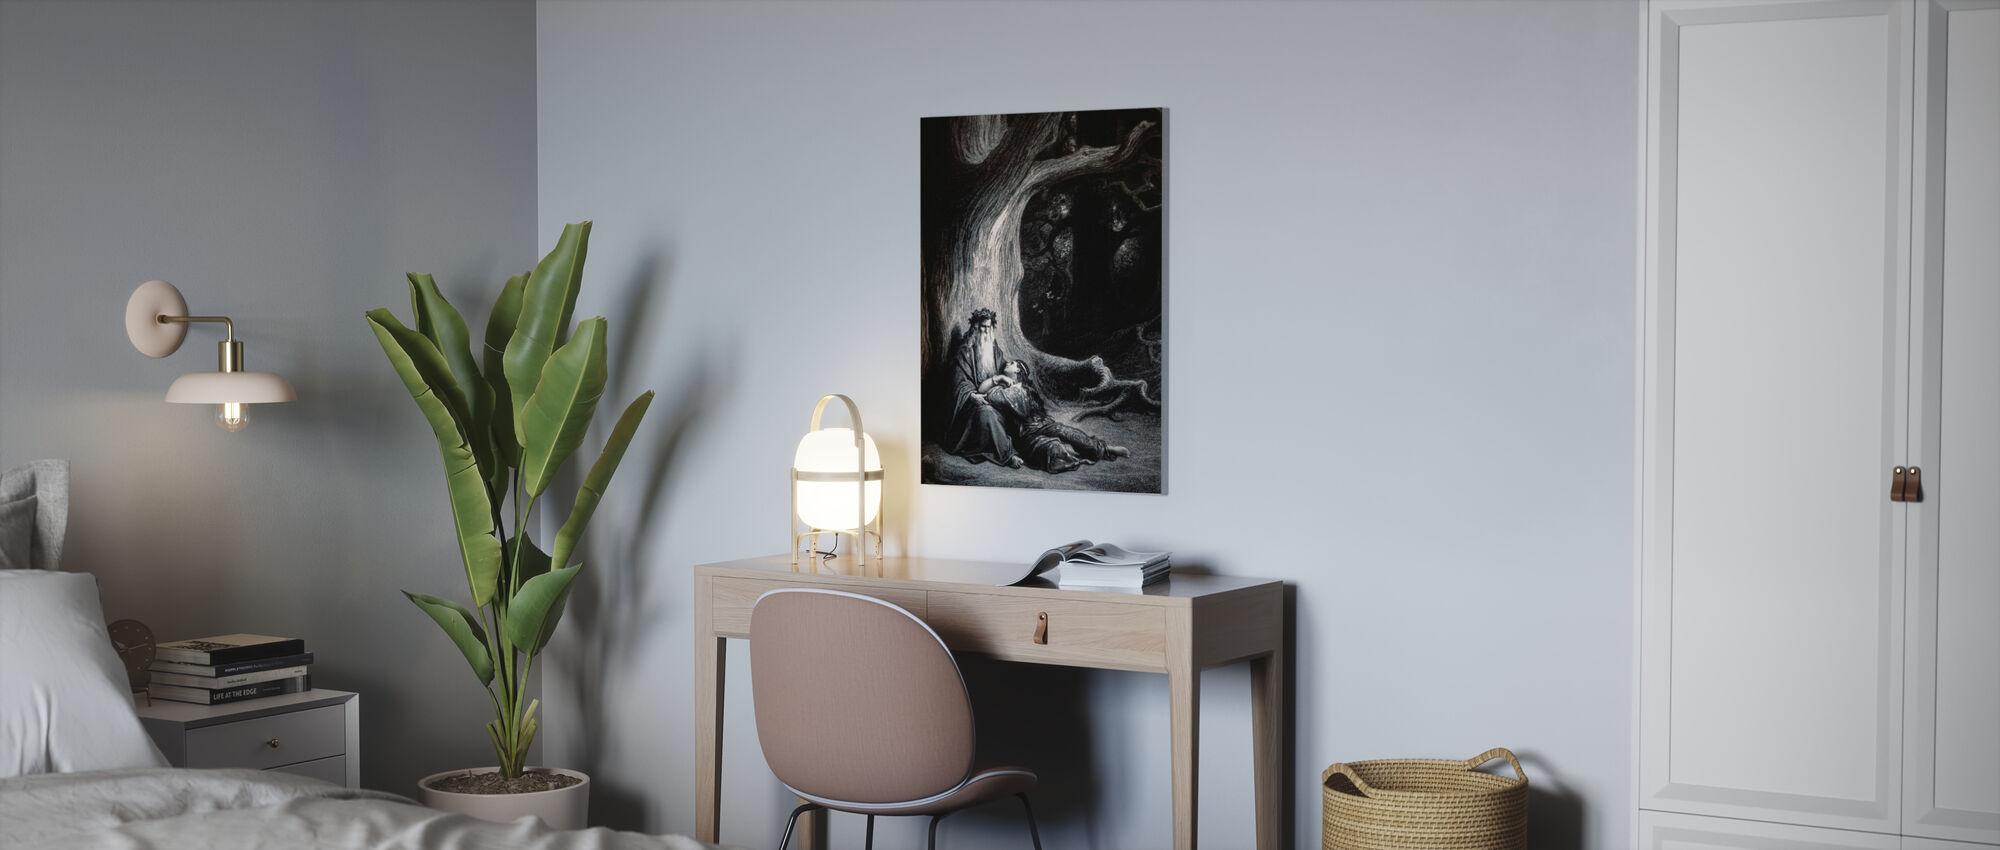 Gustave Dore - Erovringen av Graal - Canvas print - Office